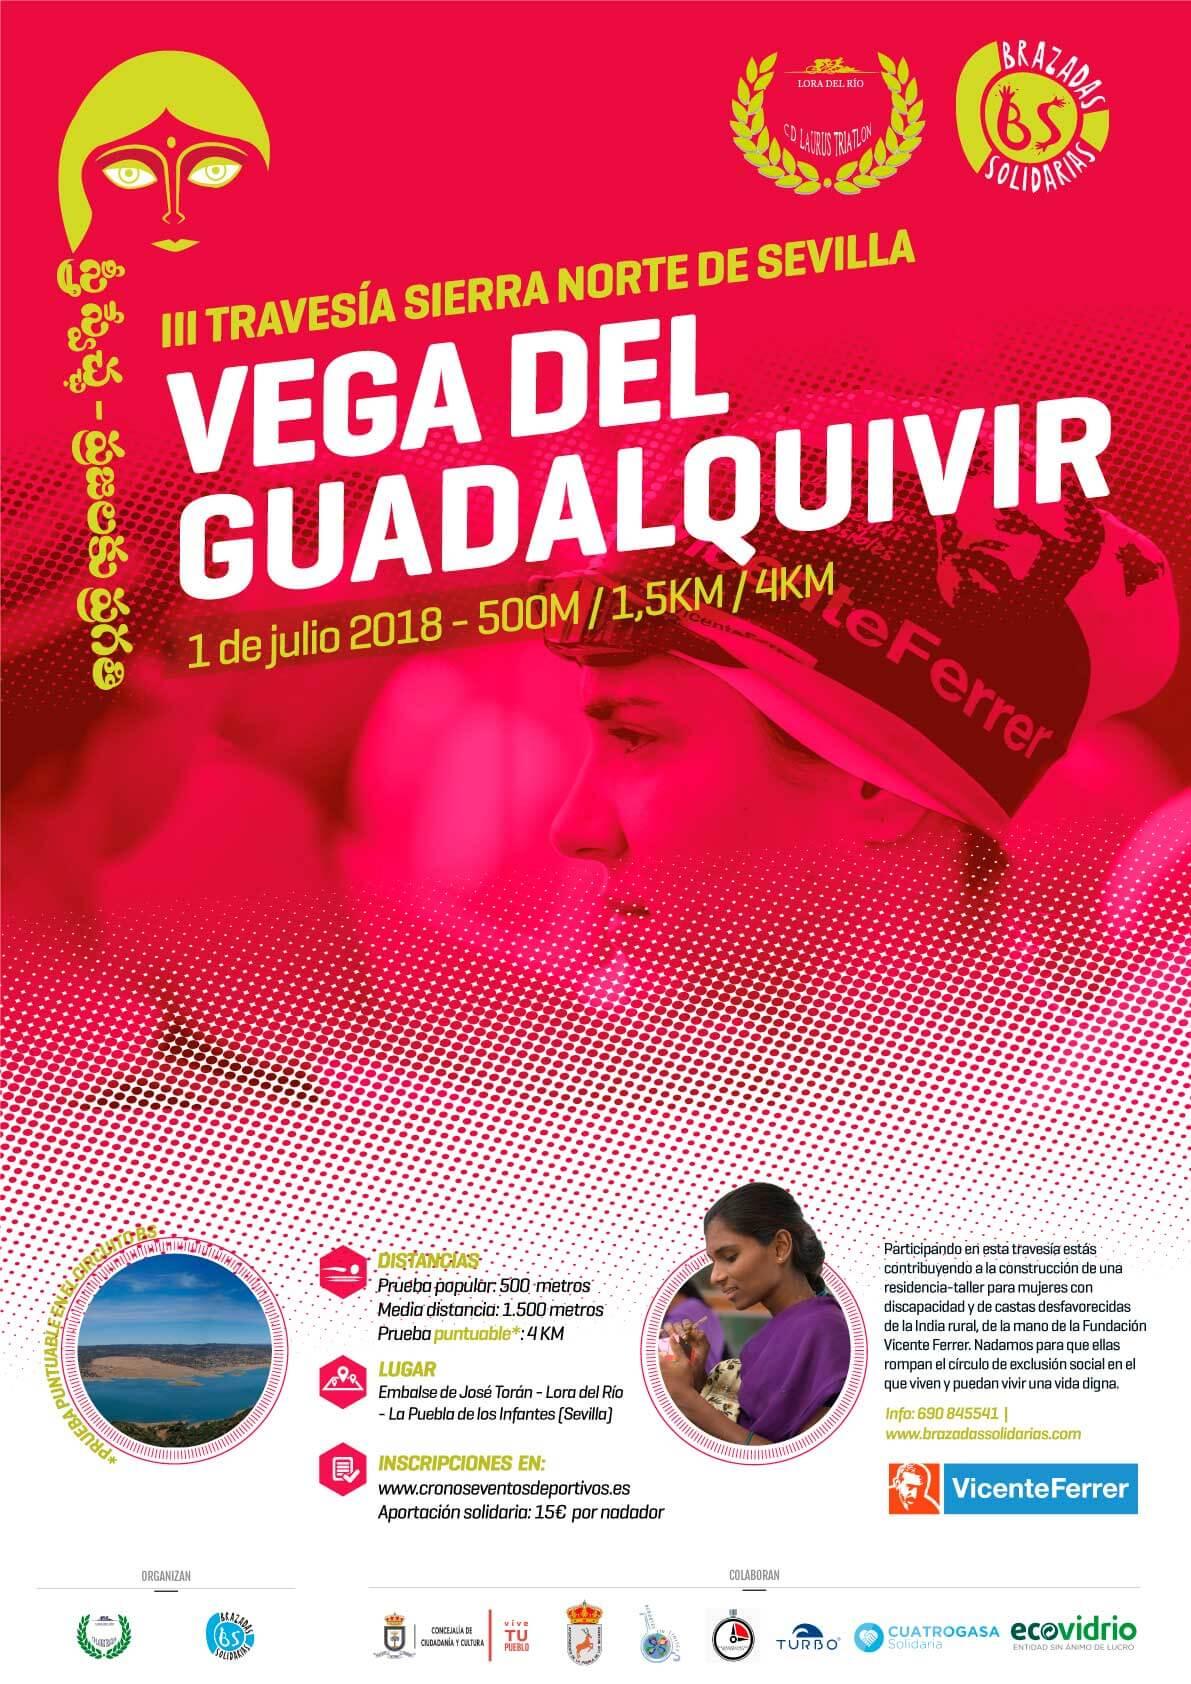 III Travesía Vega del Guadalquivir - Sierra Norte de Sevilla 2018